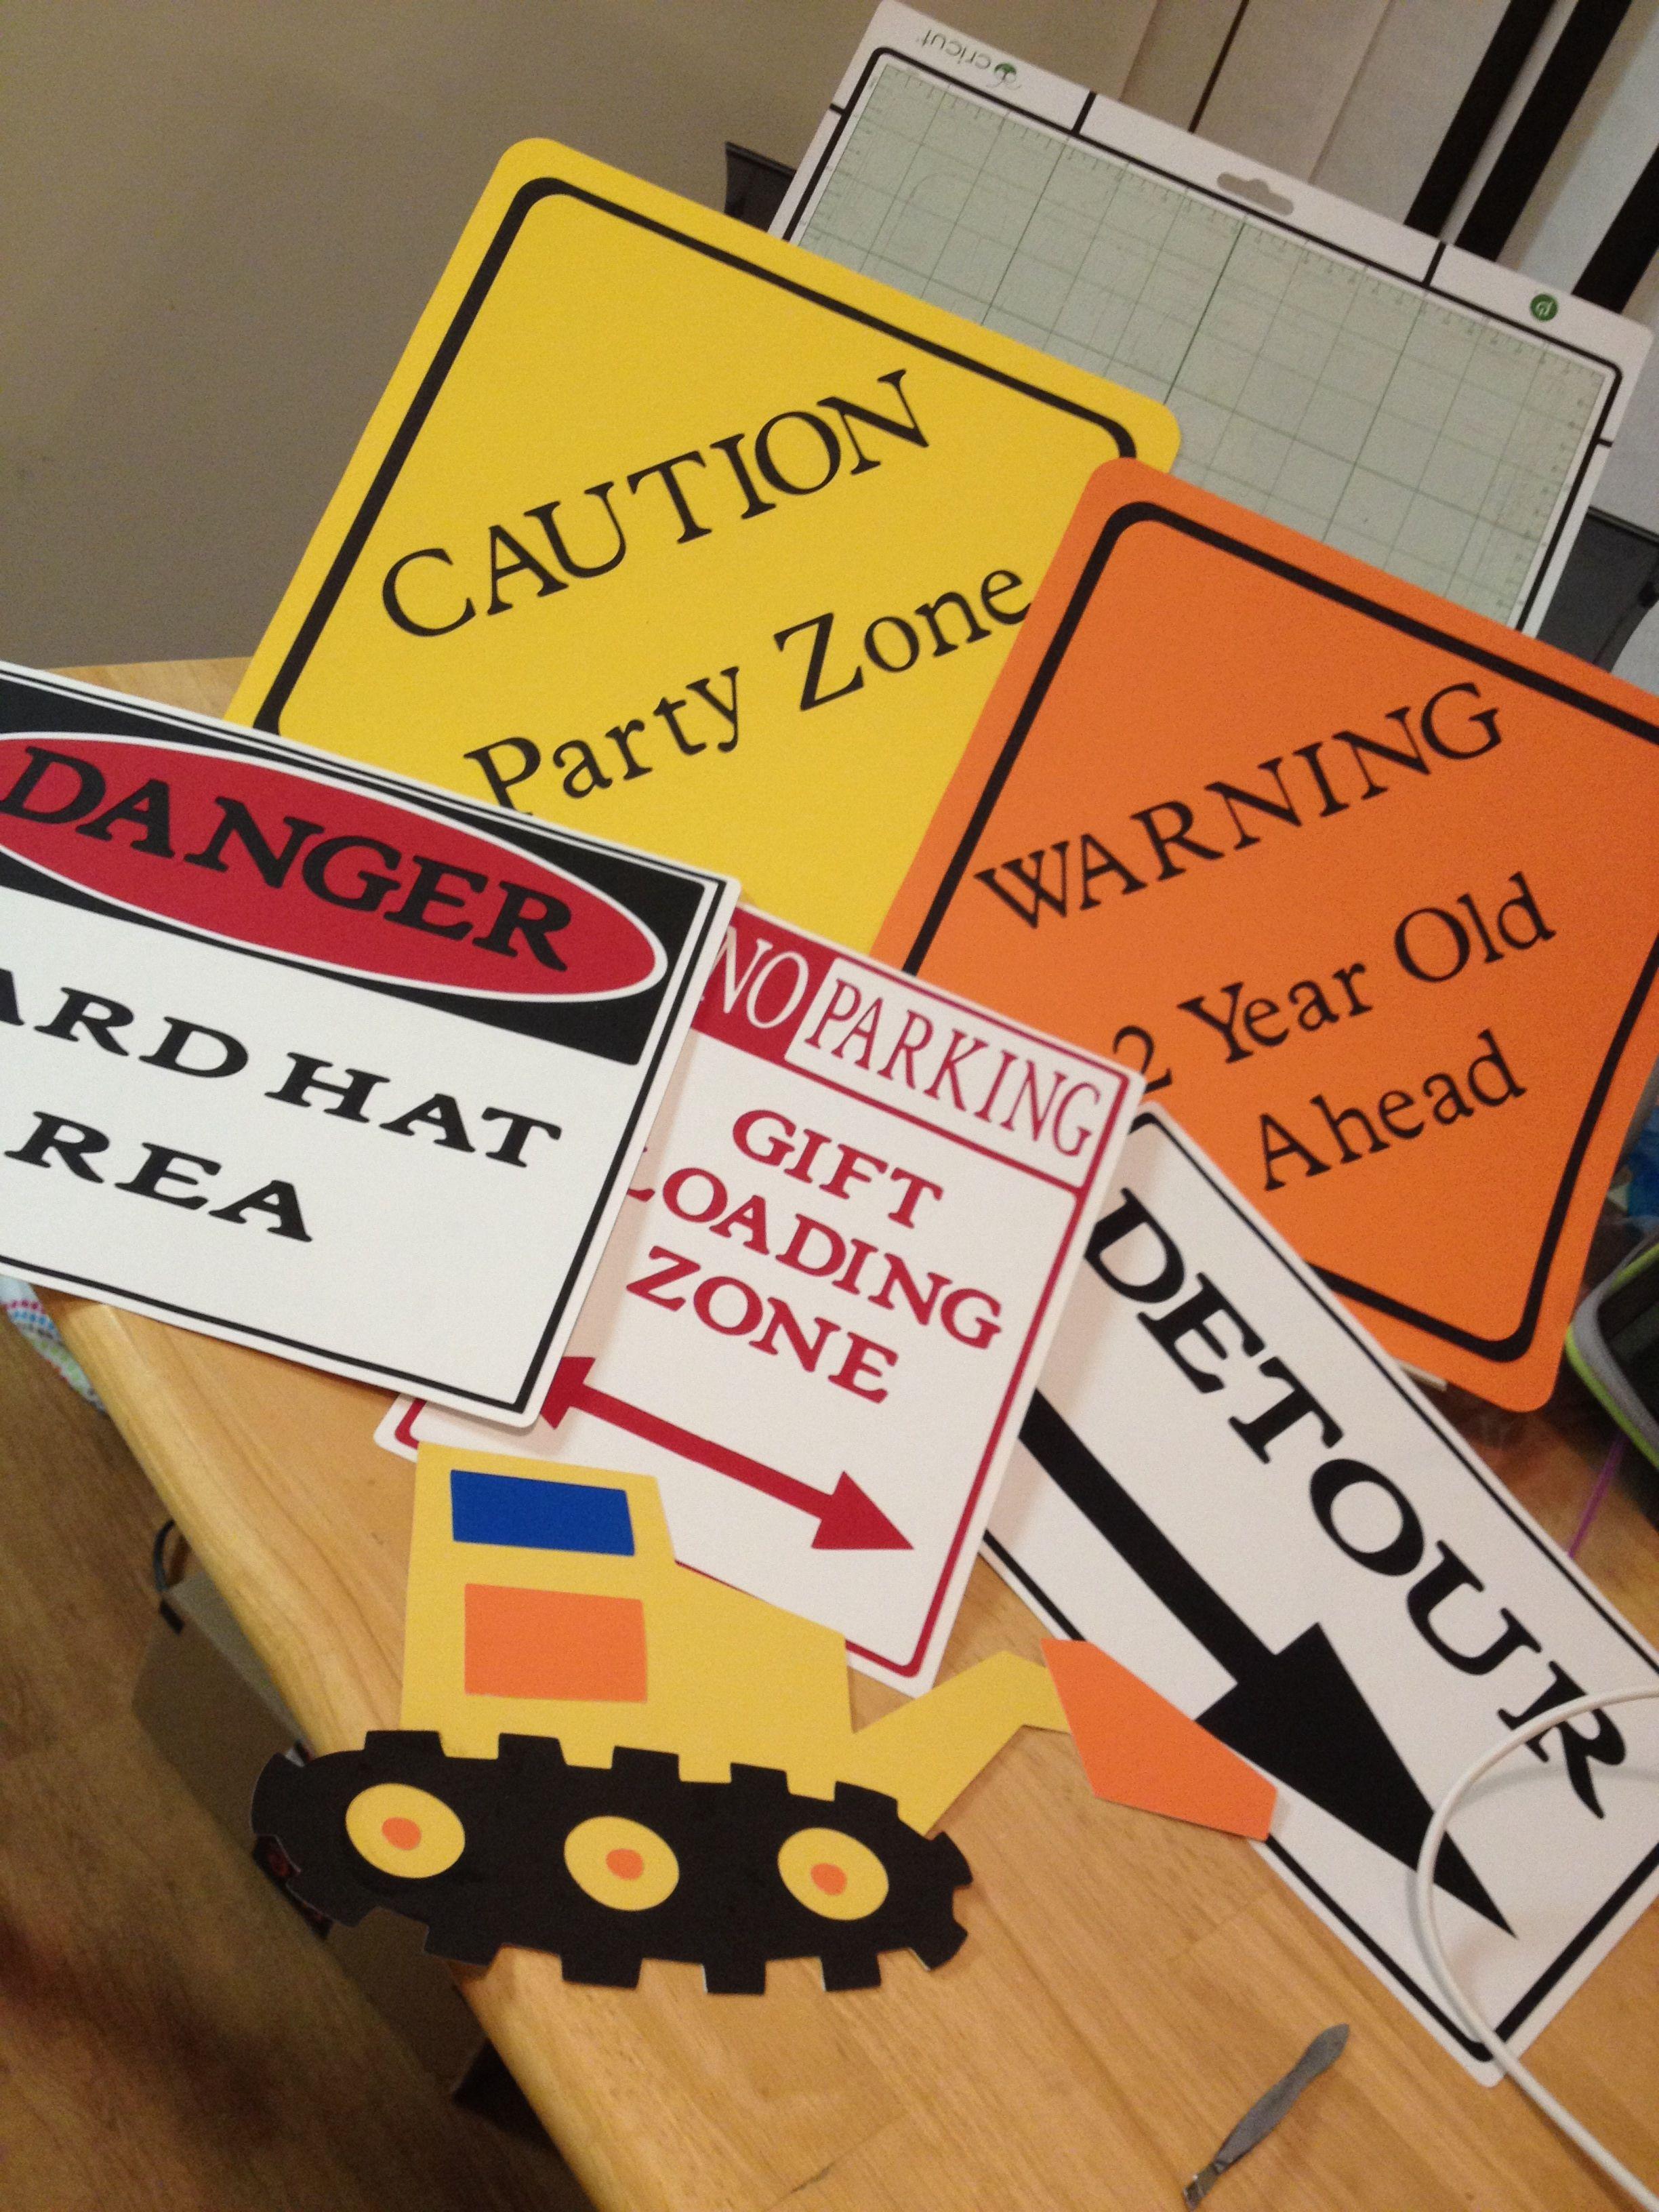 Construction signs using Cricut and Cricut Craft Room